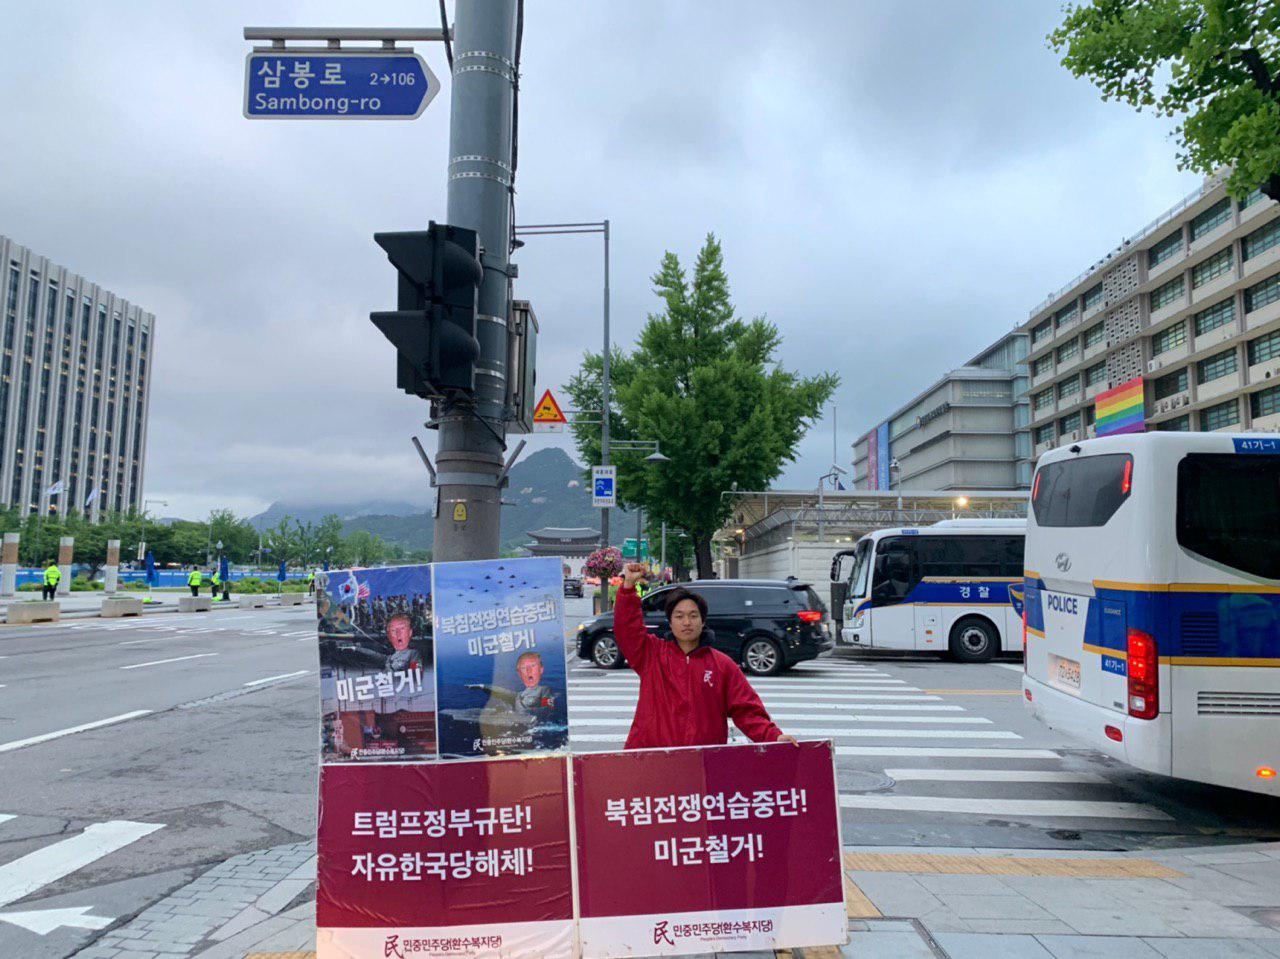 photo_2019-05-27_13-28-50.jpg